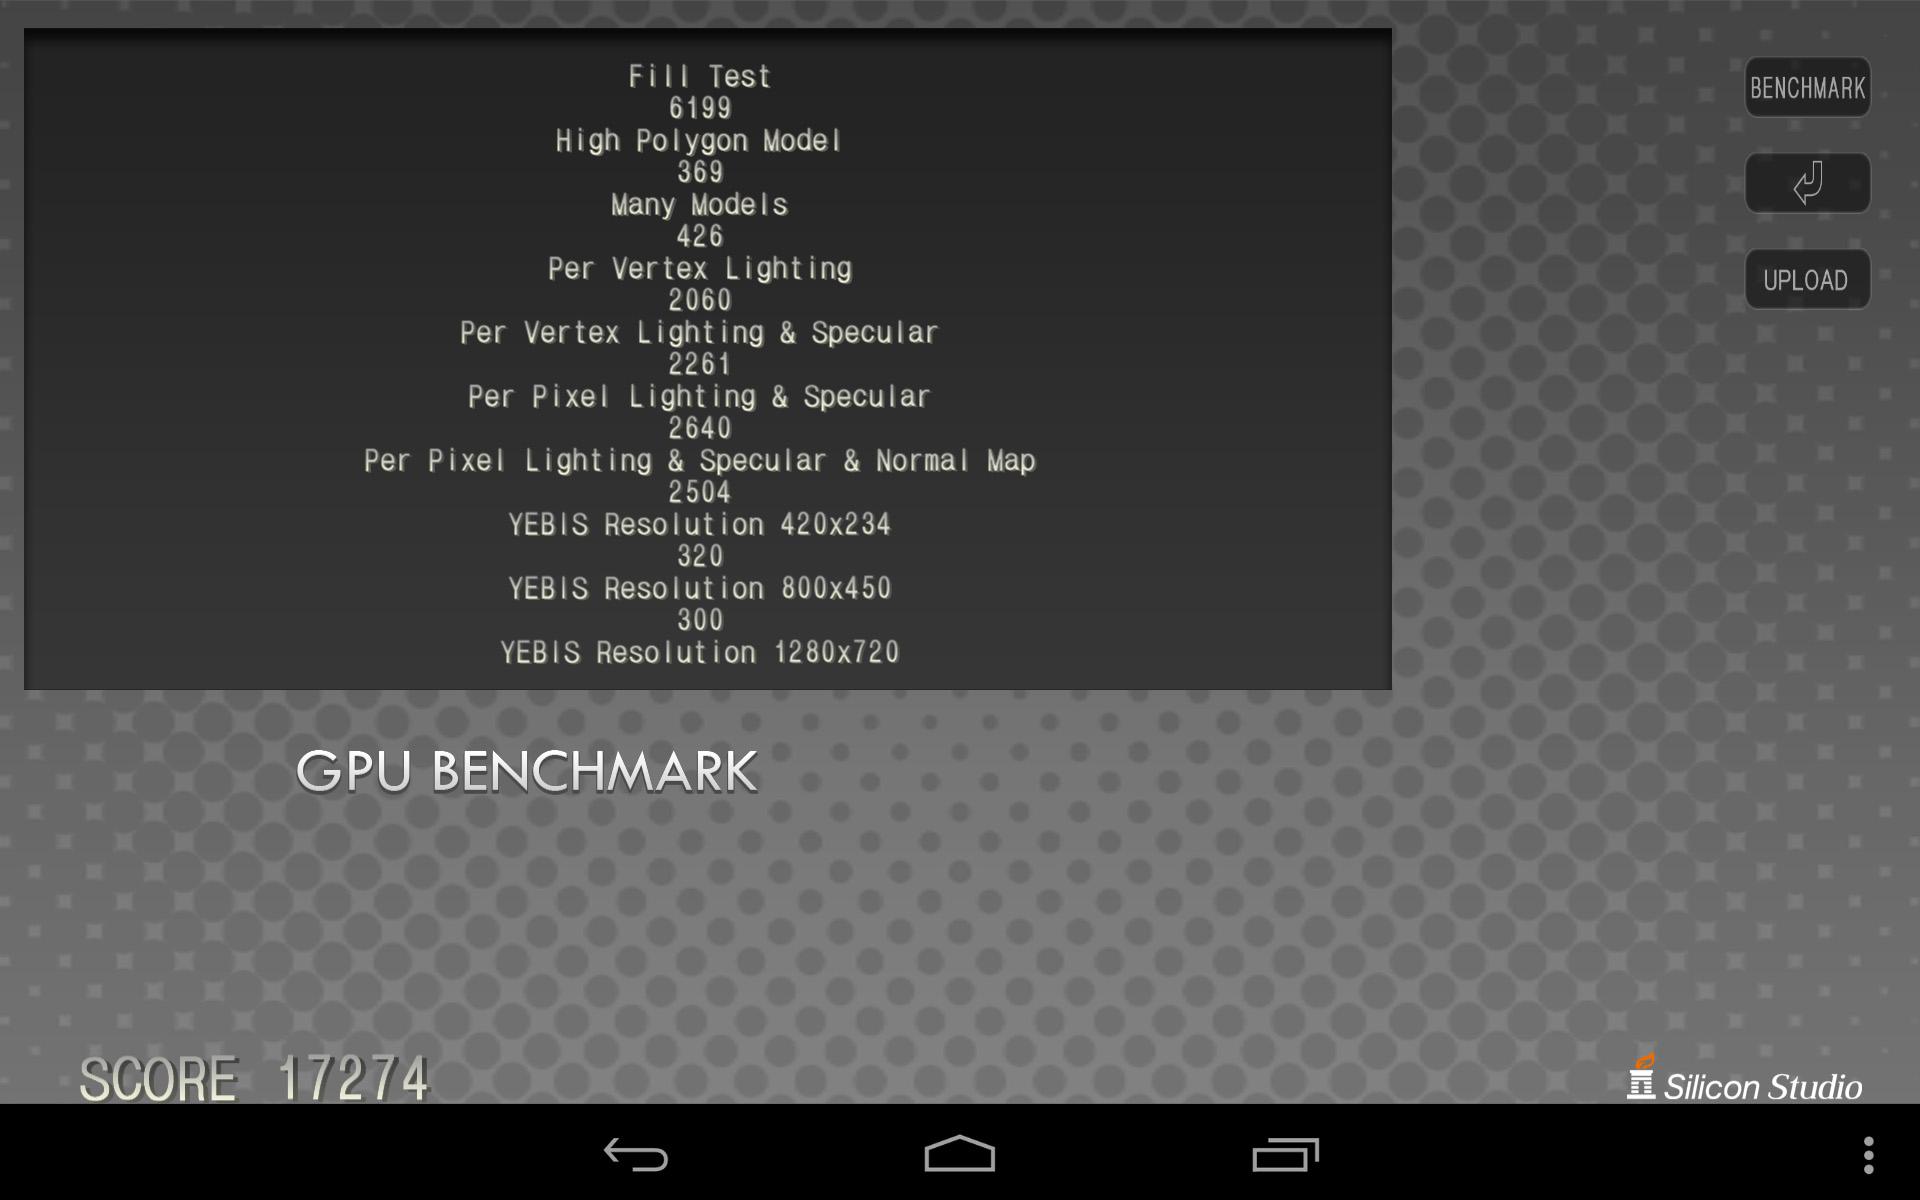 GPU BENCHMARK。スコアは6199/369/426/2060/2261/2640/2504/320/300/195